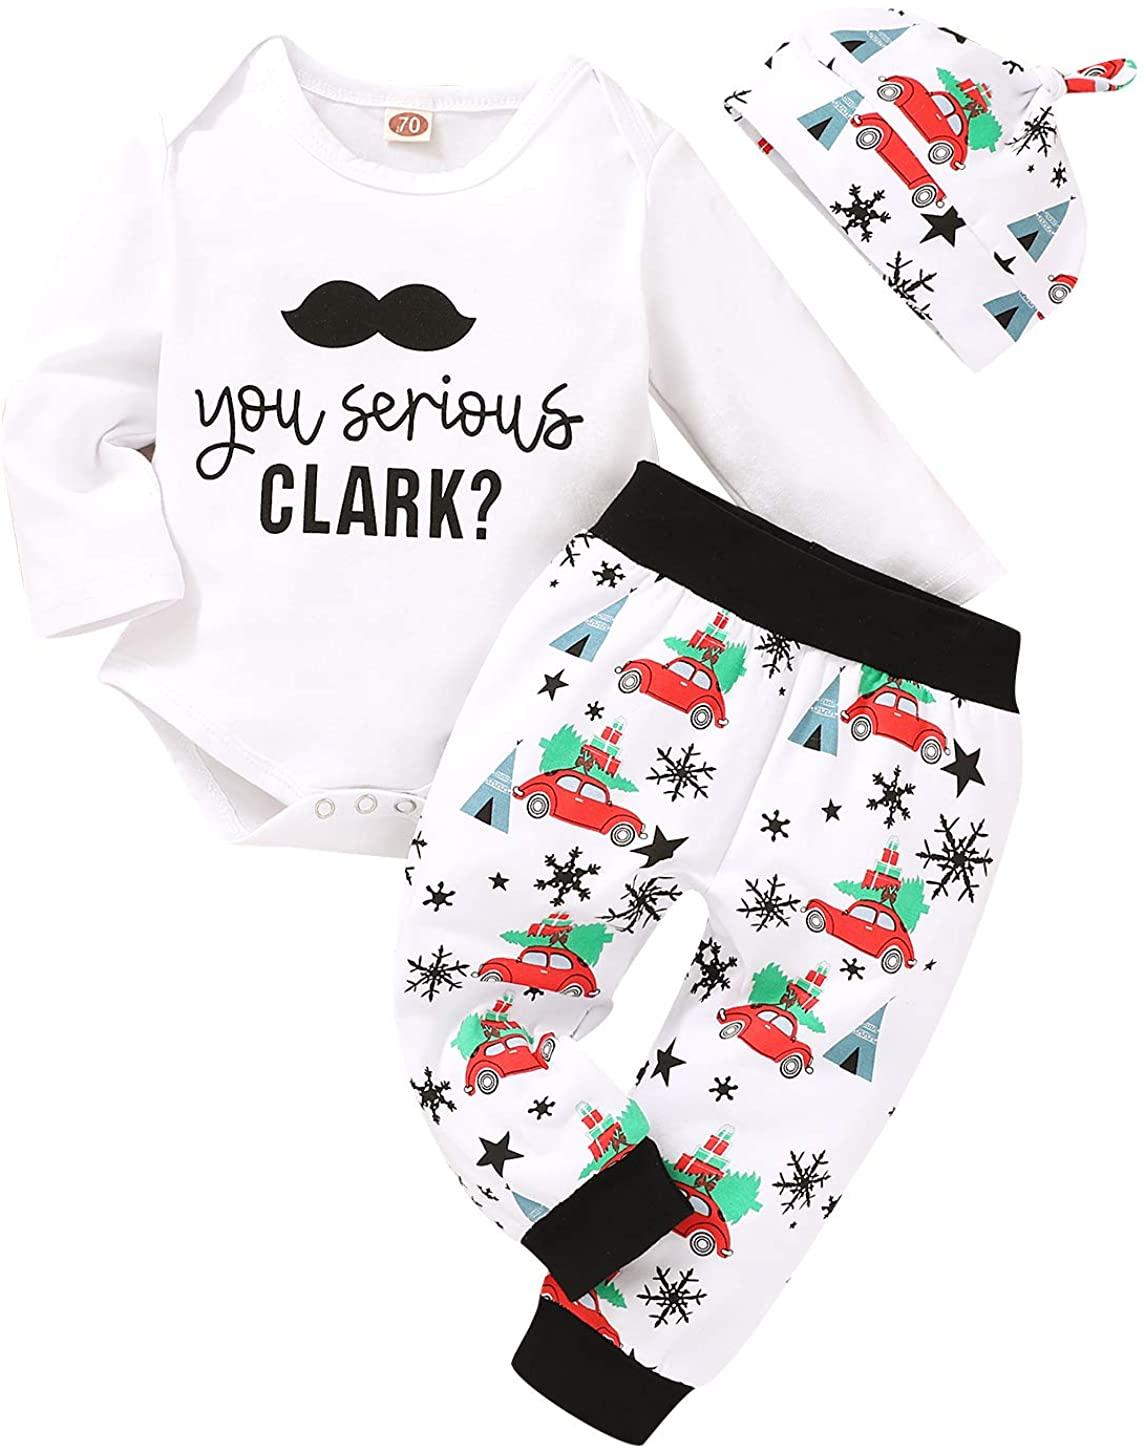 3Pcs Newborn Baby Pajamas Xmas Car Romper Pants+Xmas Hat Coming Home Outfits Set